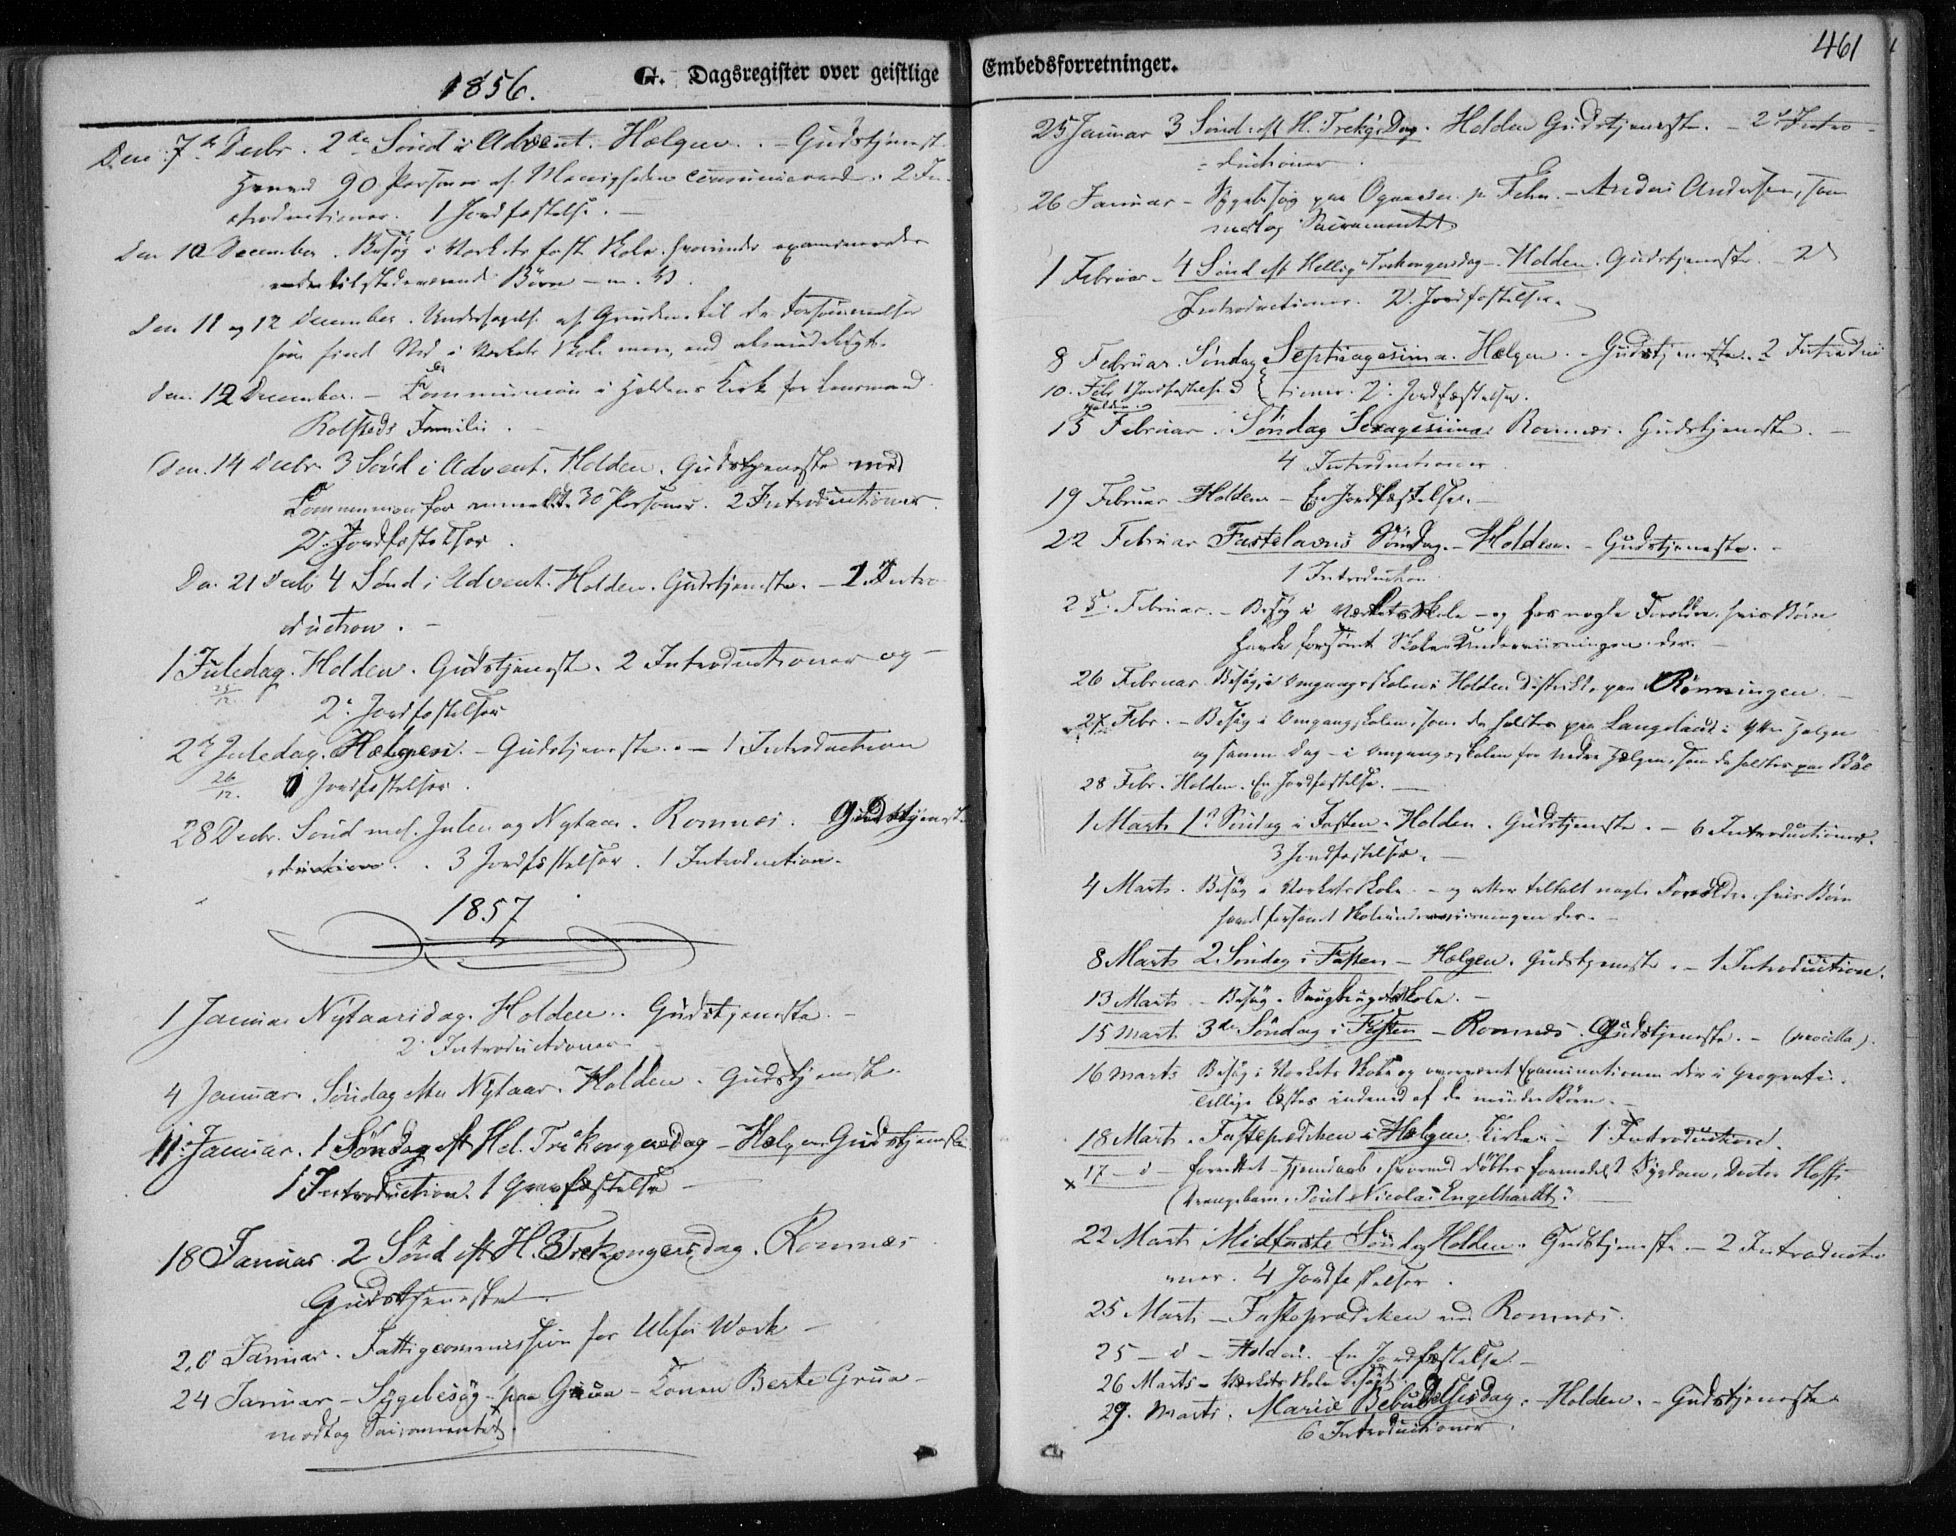 SAKO, Holla kirkebøker, F/Fa/L0005: Ministerialbok nr. 5, 1849-1860, s. 461